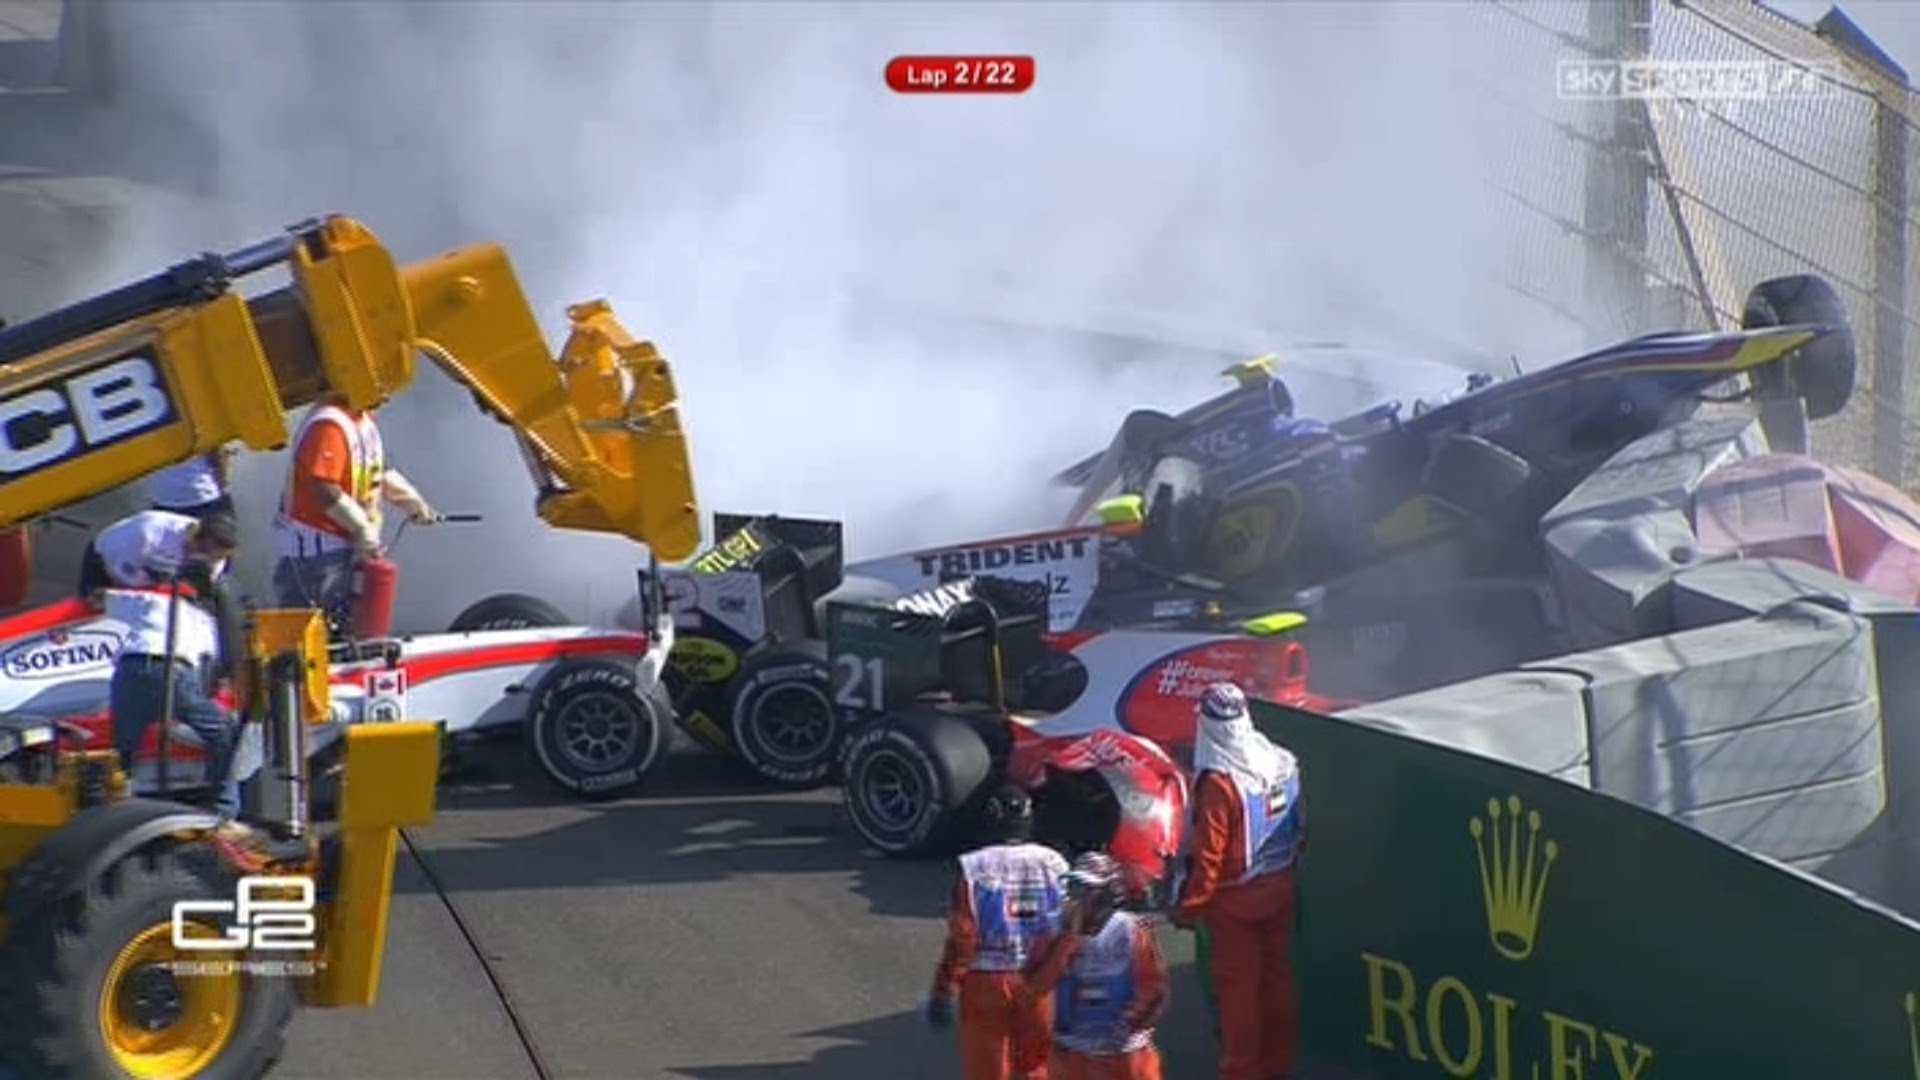 2015 GP2 season crash in Abu Dhabi